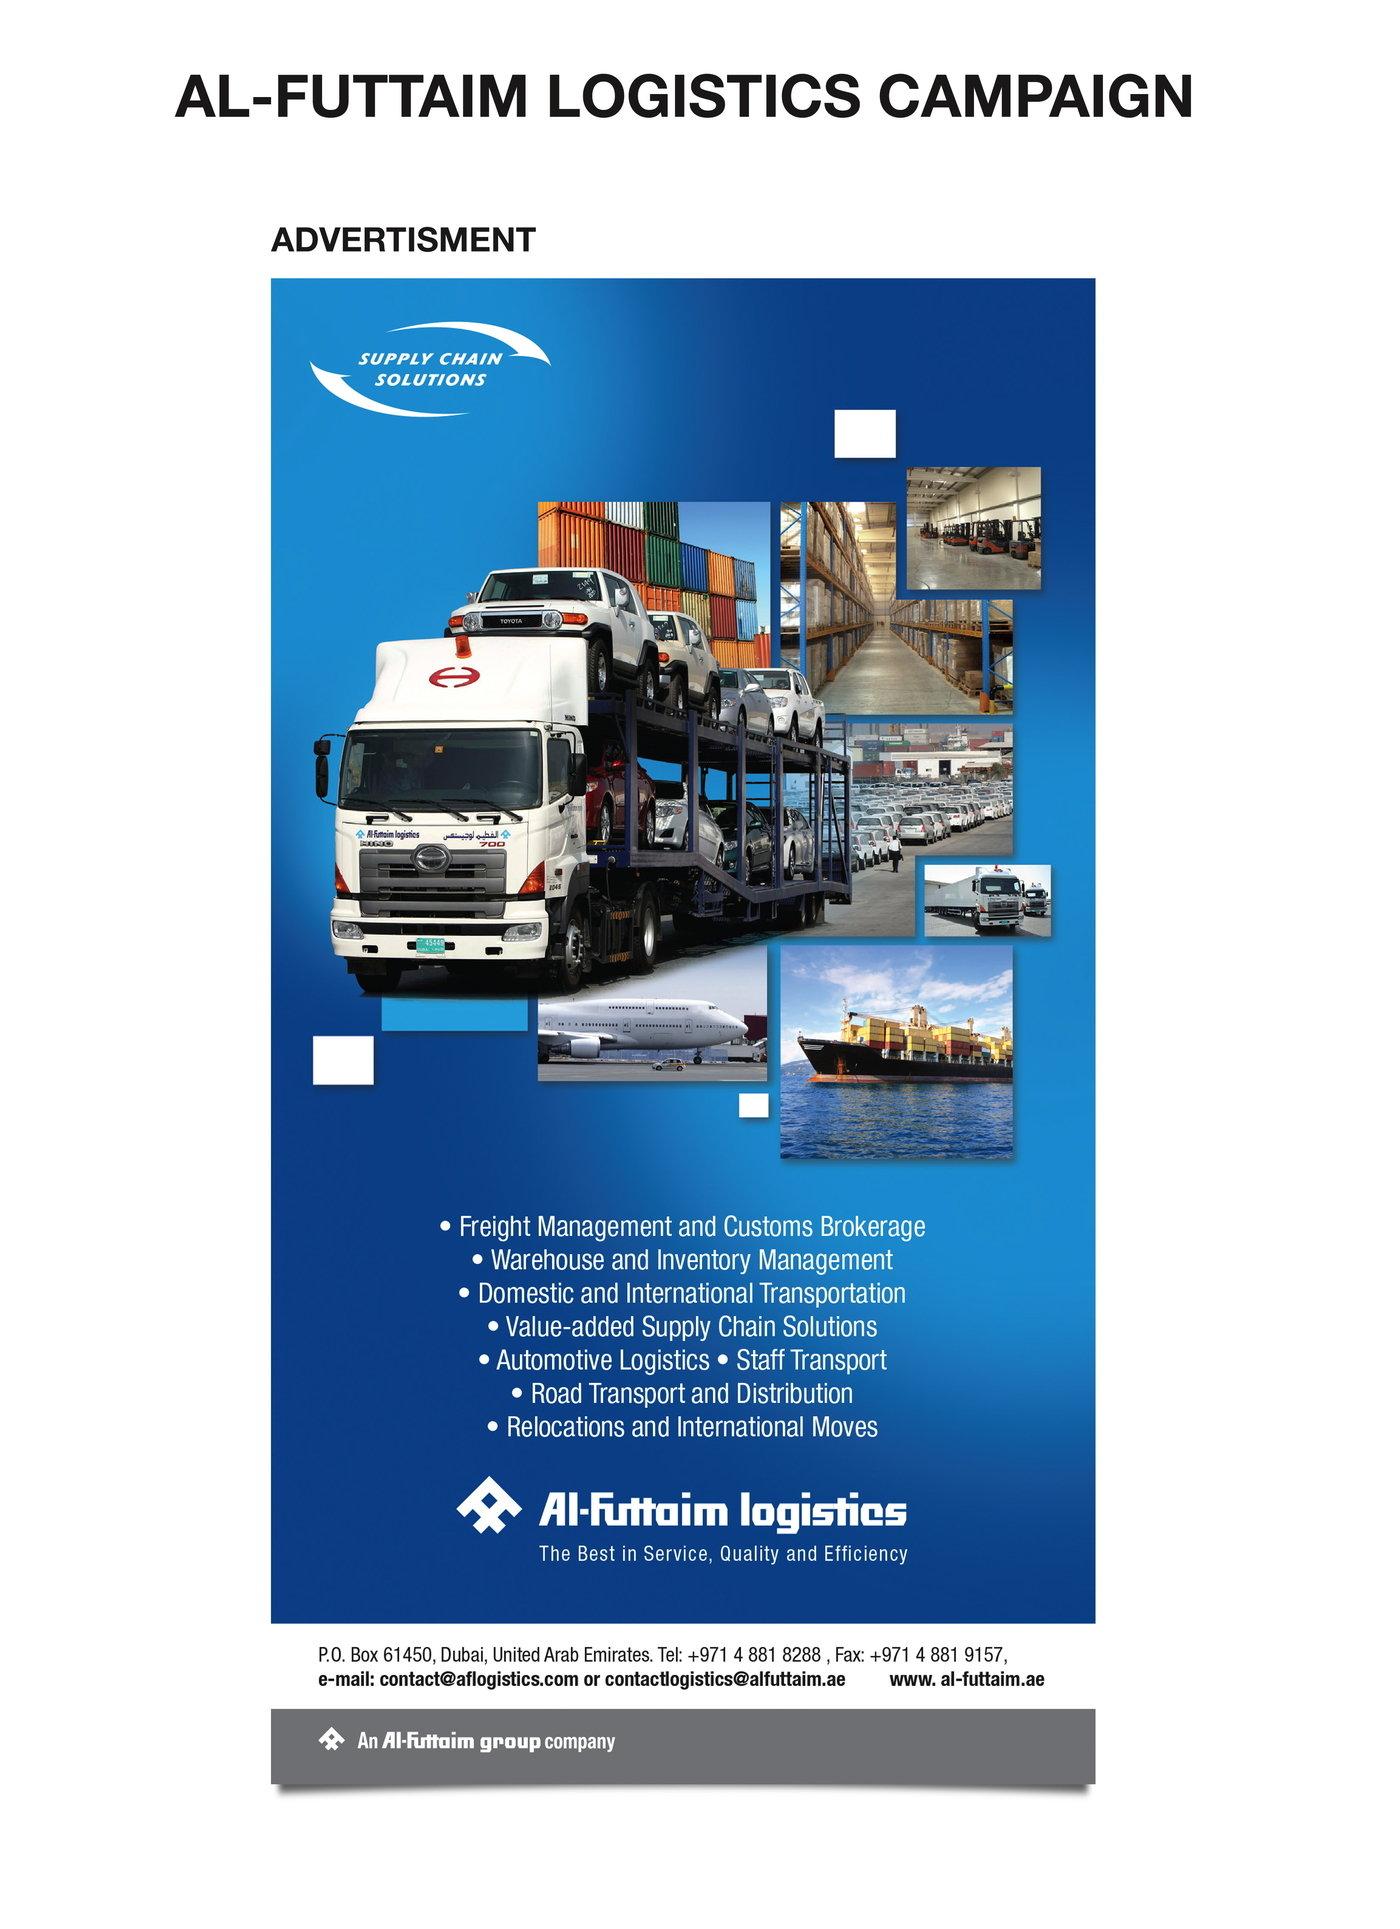 Al-Futtaim Logistics Campaign by Tarek Damouri at Coroflot com